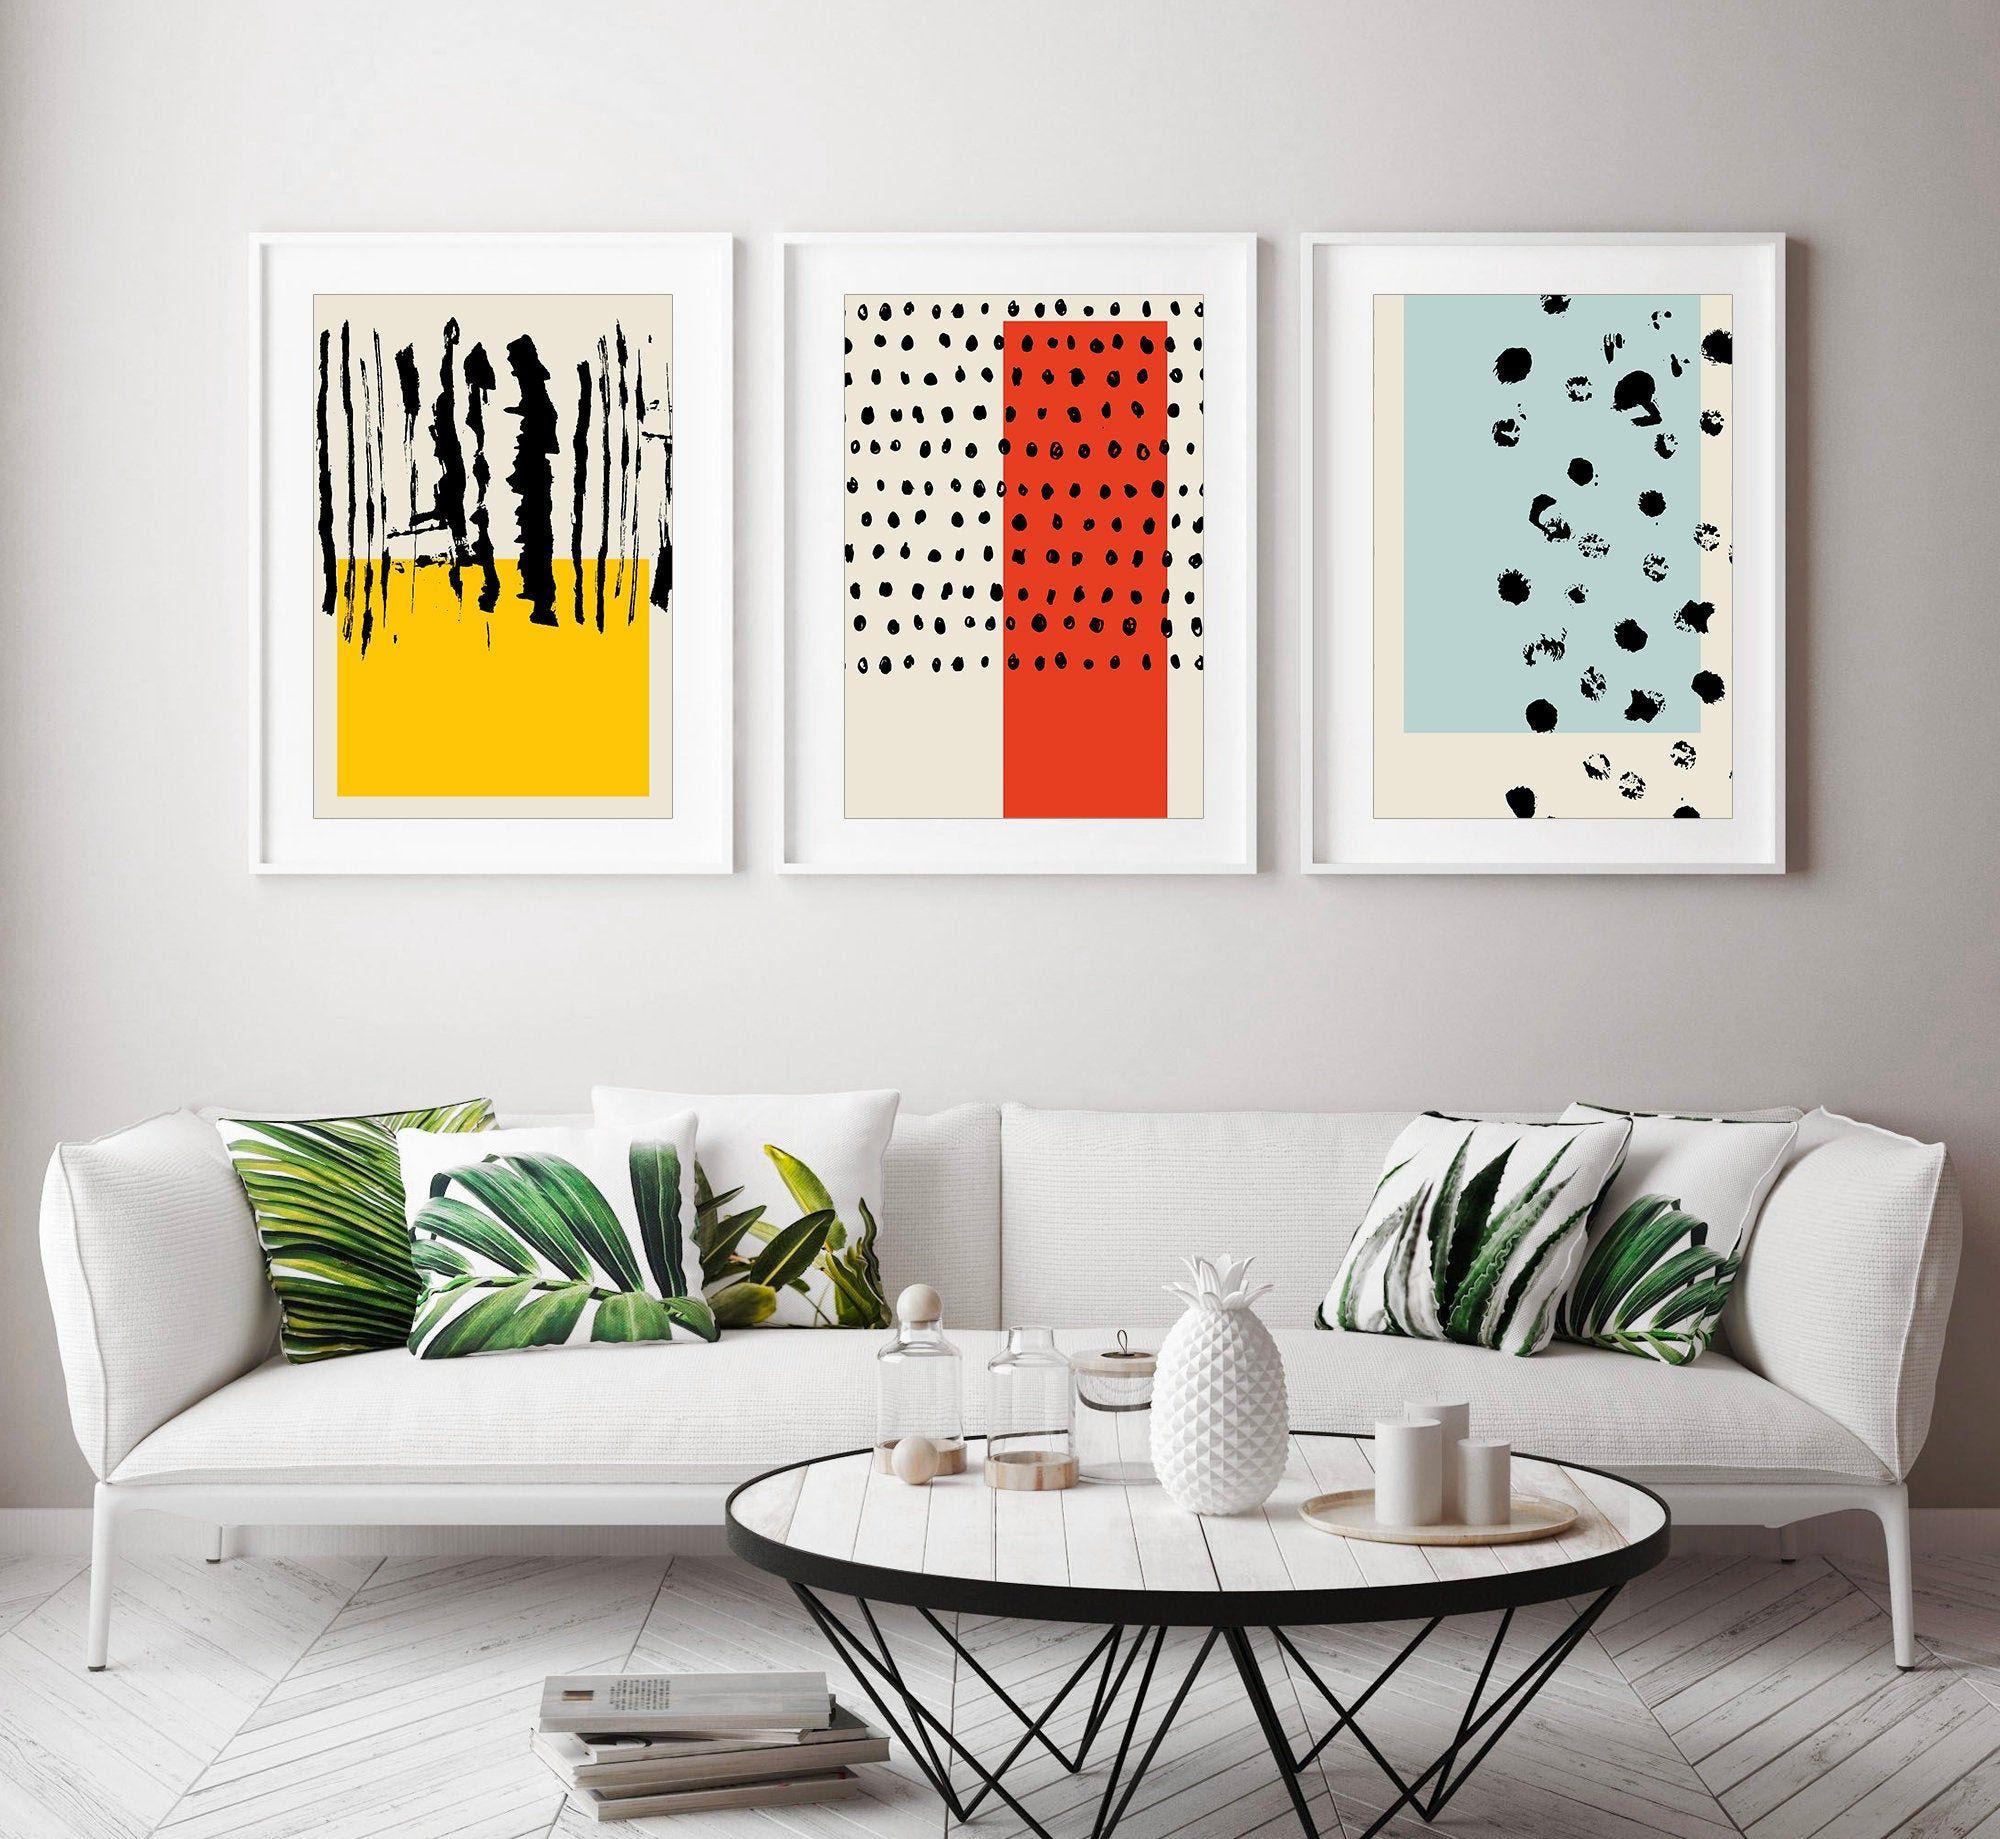 Set Of 3 Prints Minimalist Prints Modern Wall Art Living Etsy Wall Art Living Room Living Room Art Abstract Wall Art